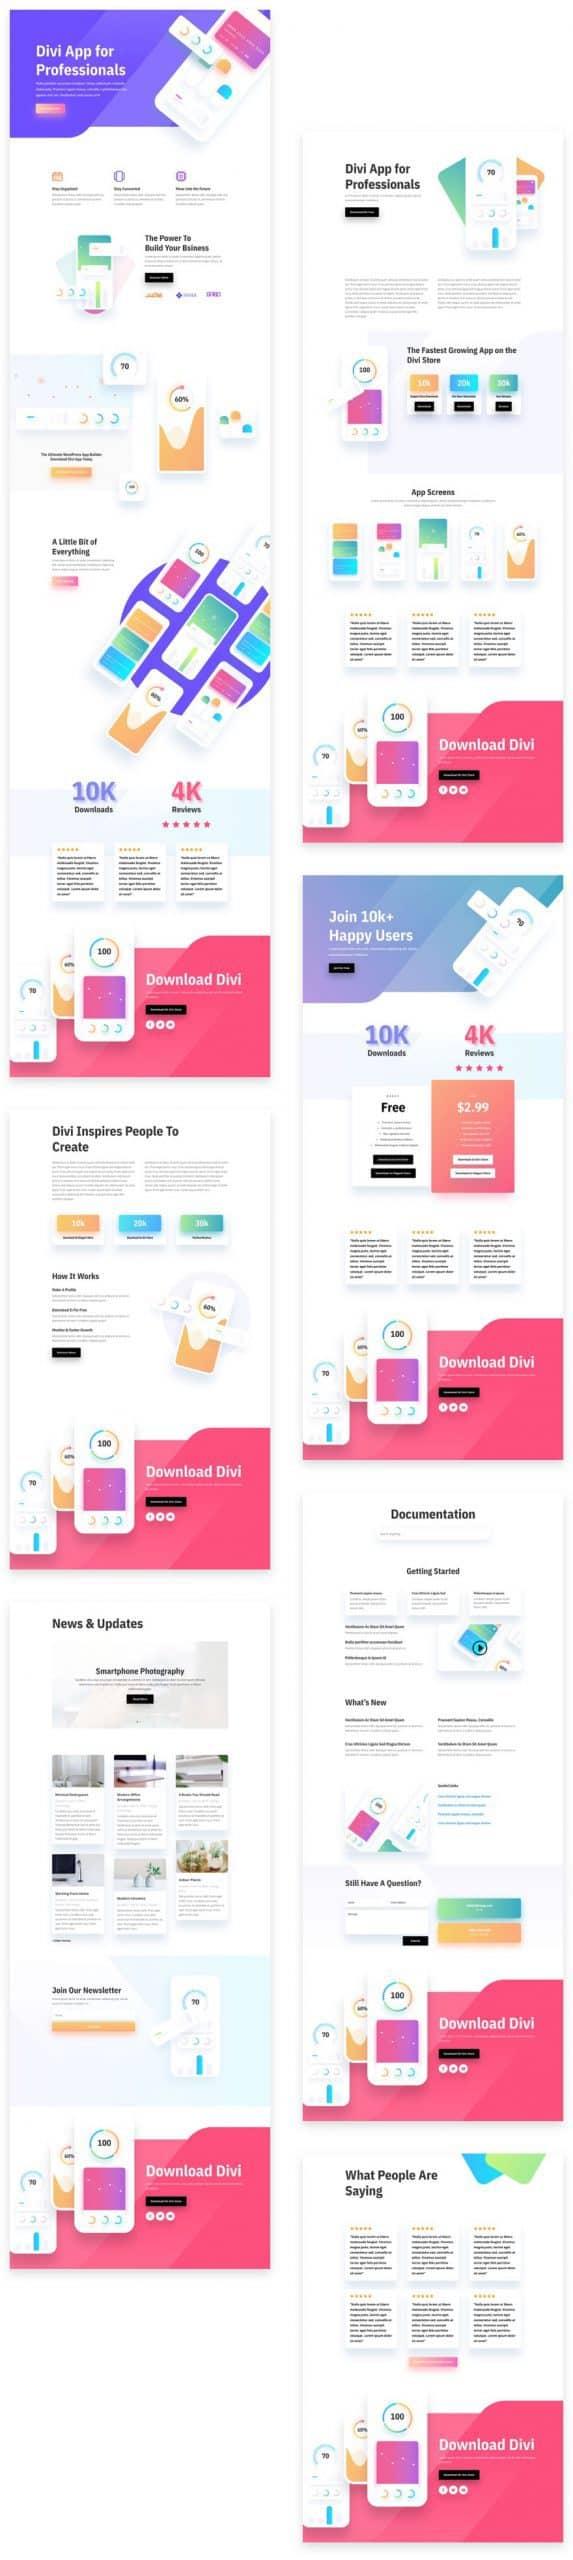 Mobile App Divi Layout Pack